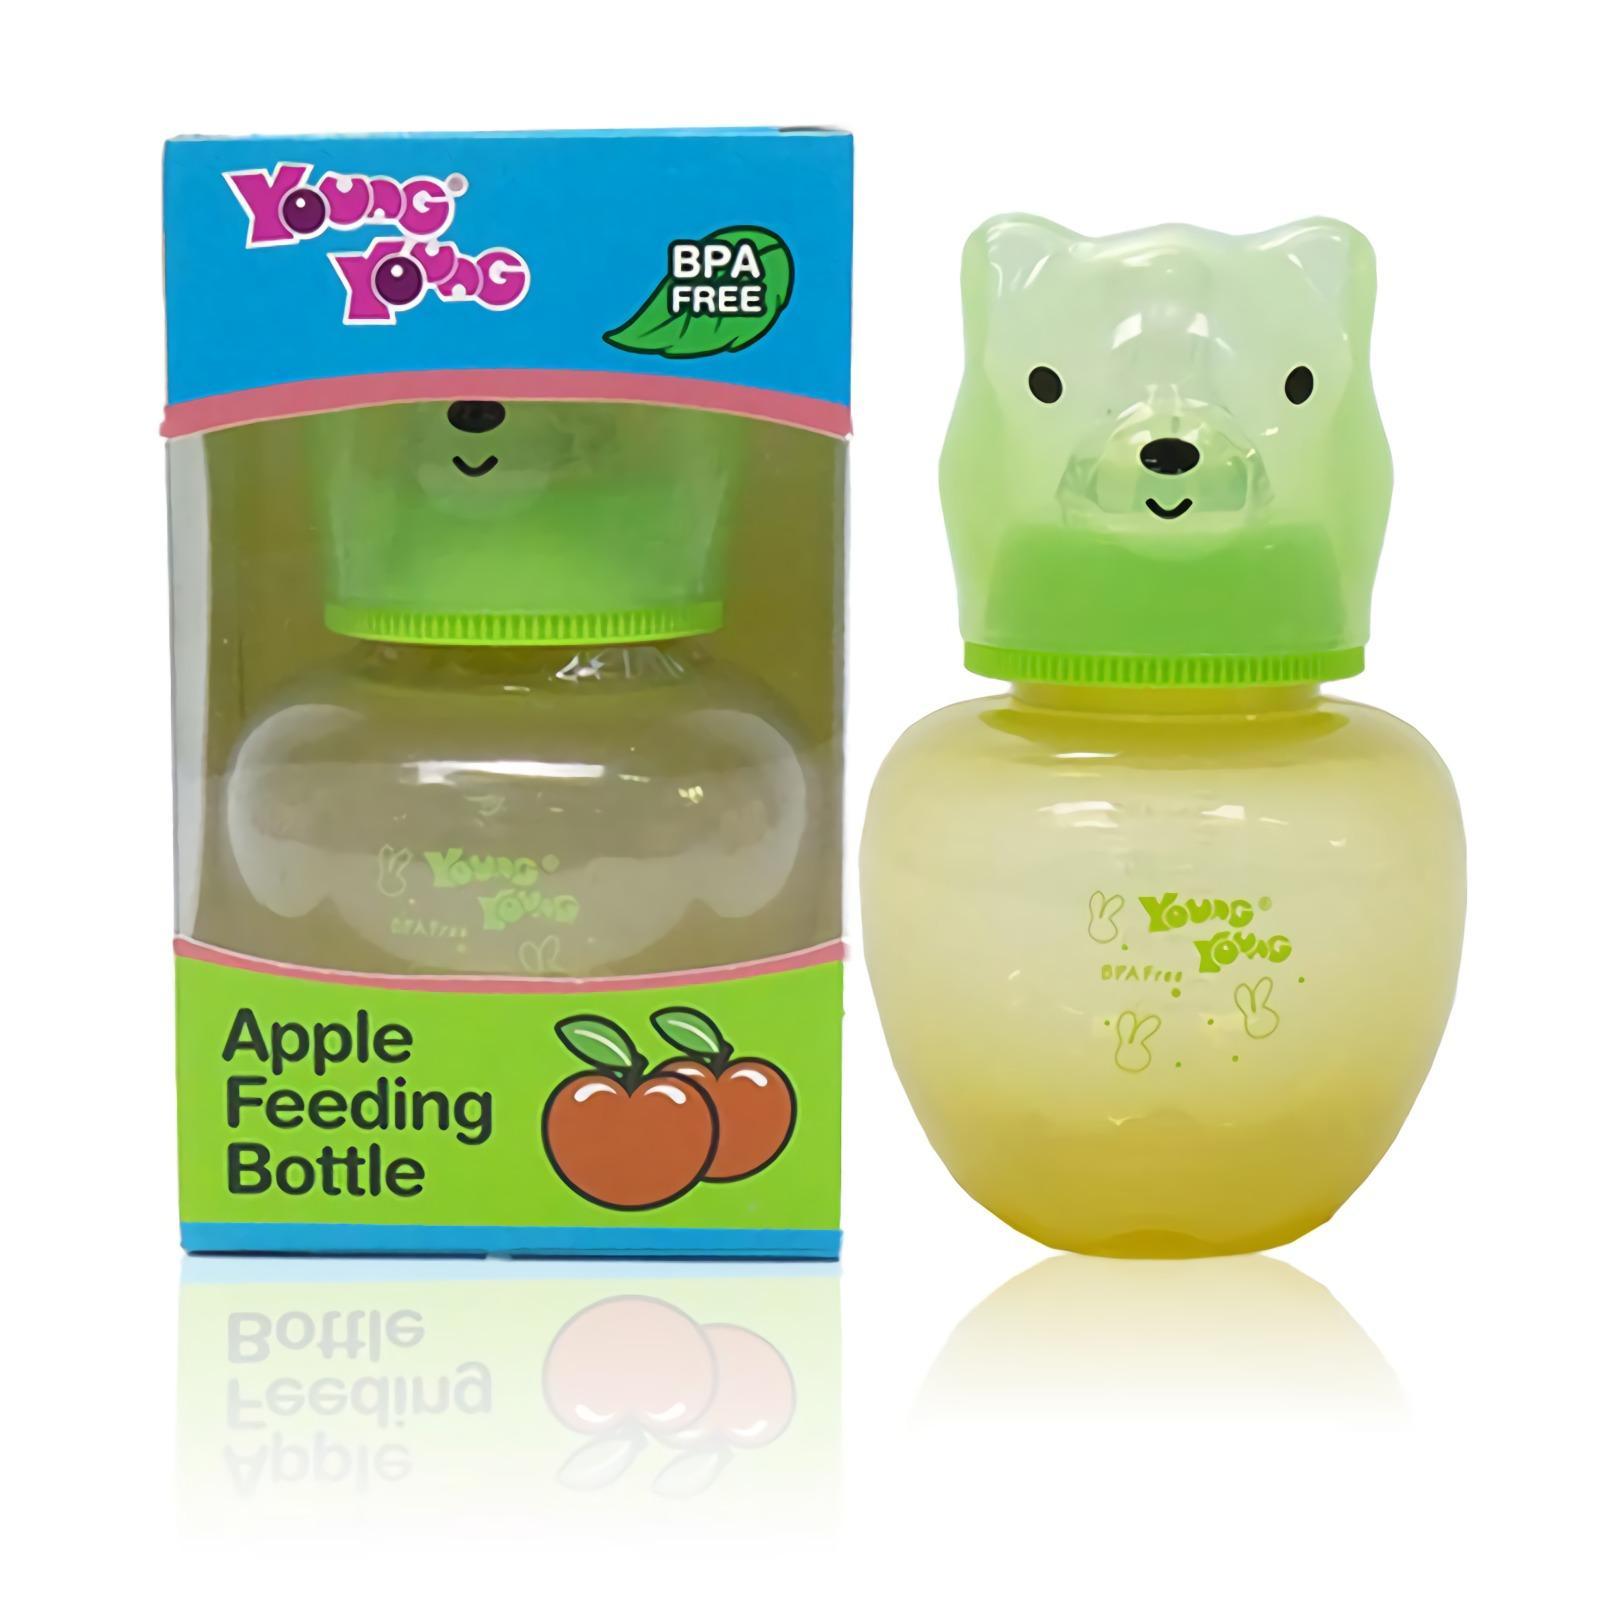 YOUNG YOUNG Botol Susu [160ML] Apple Feeding Bottle Asi BPA Free IL-816